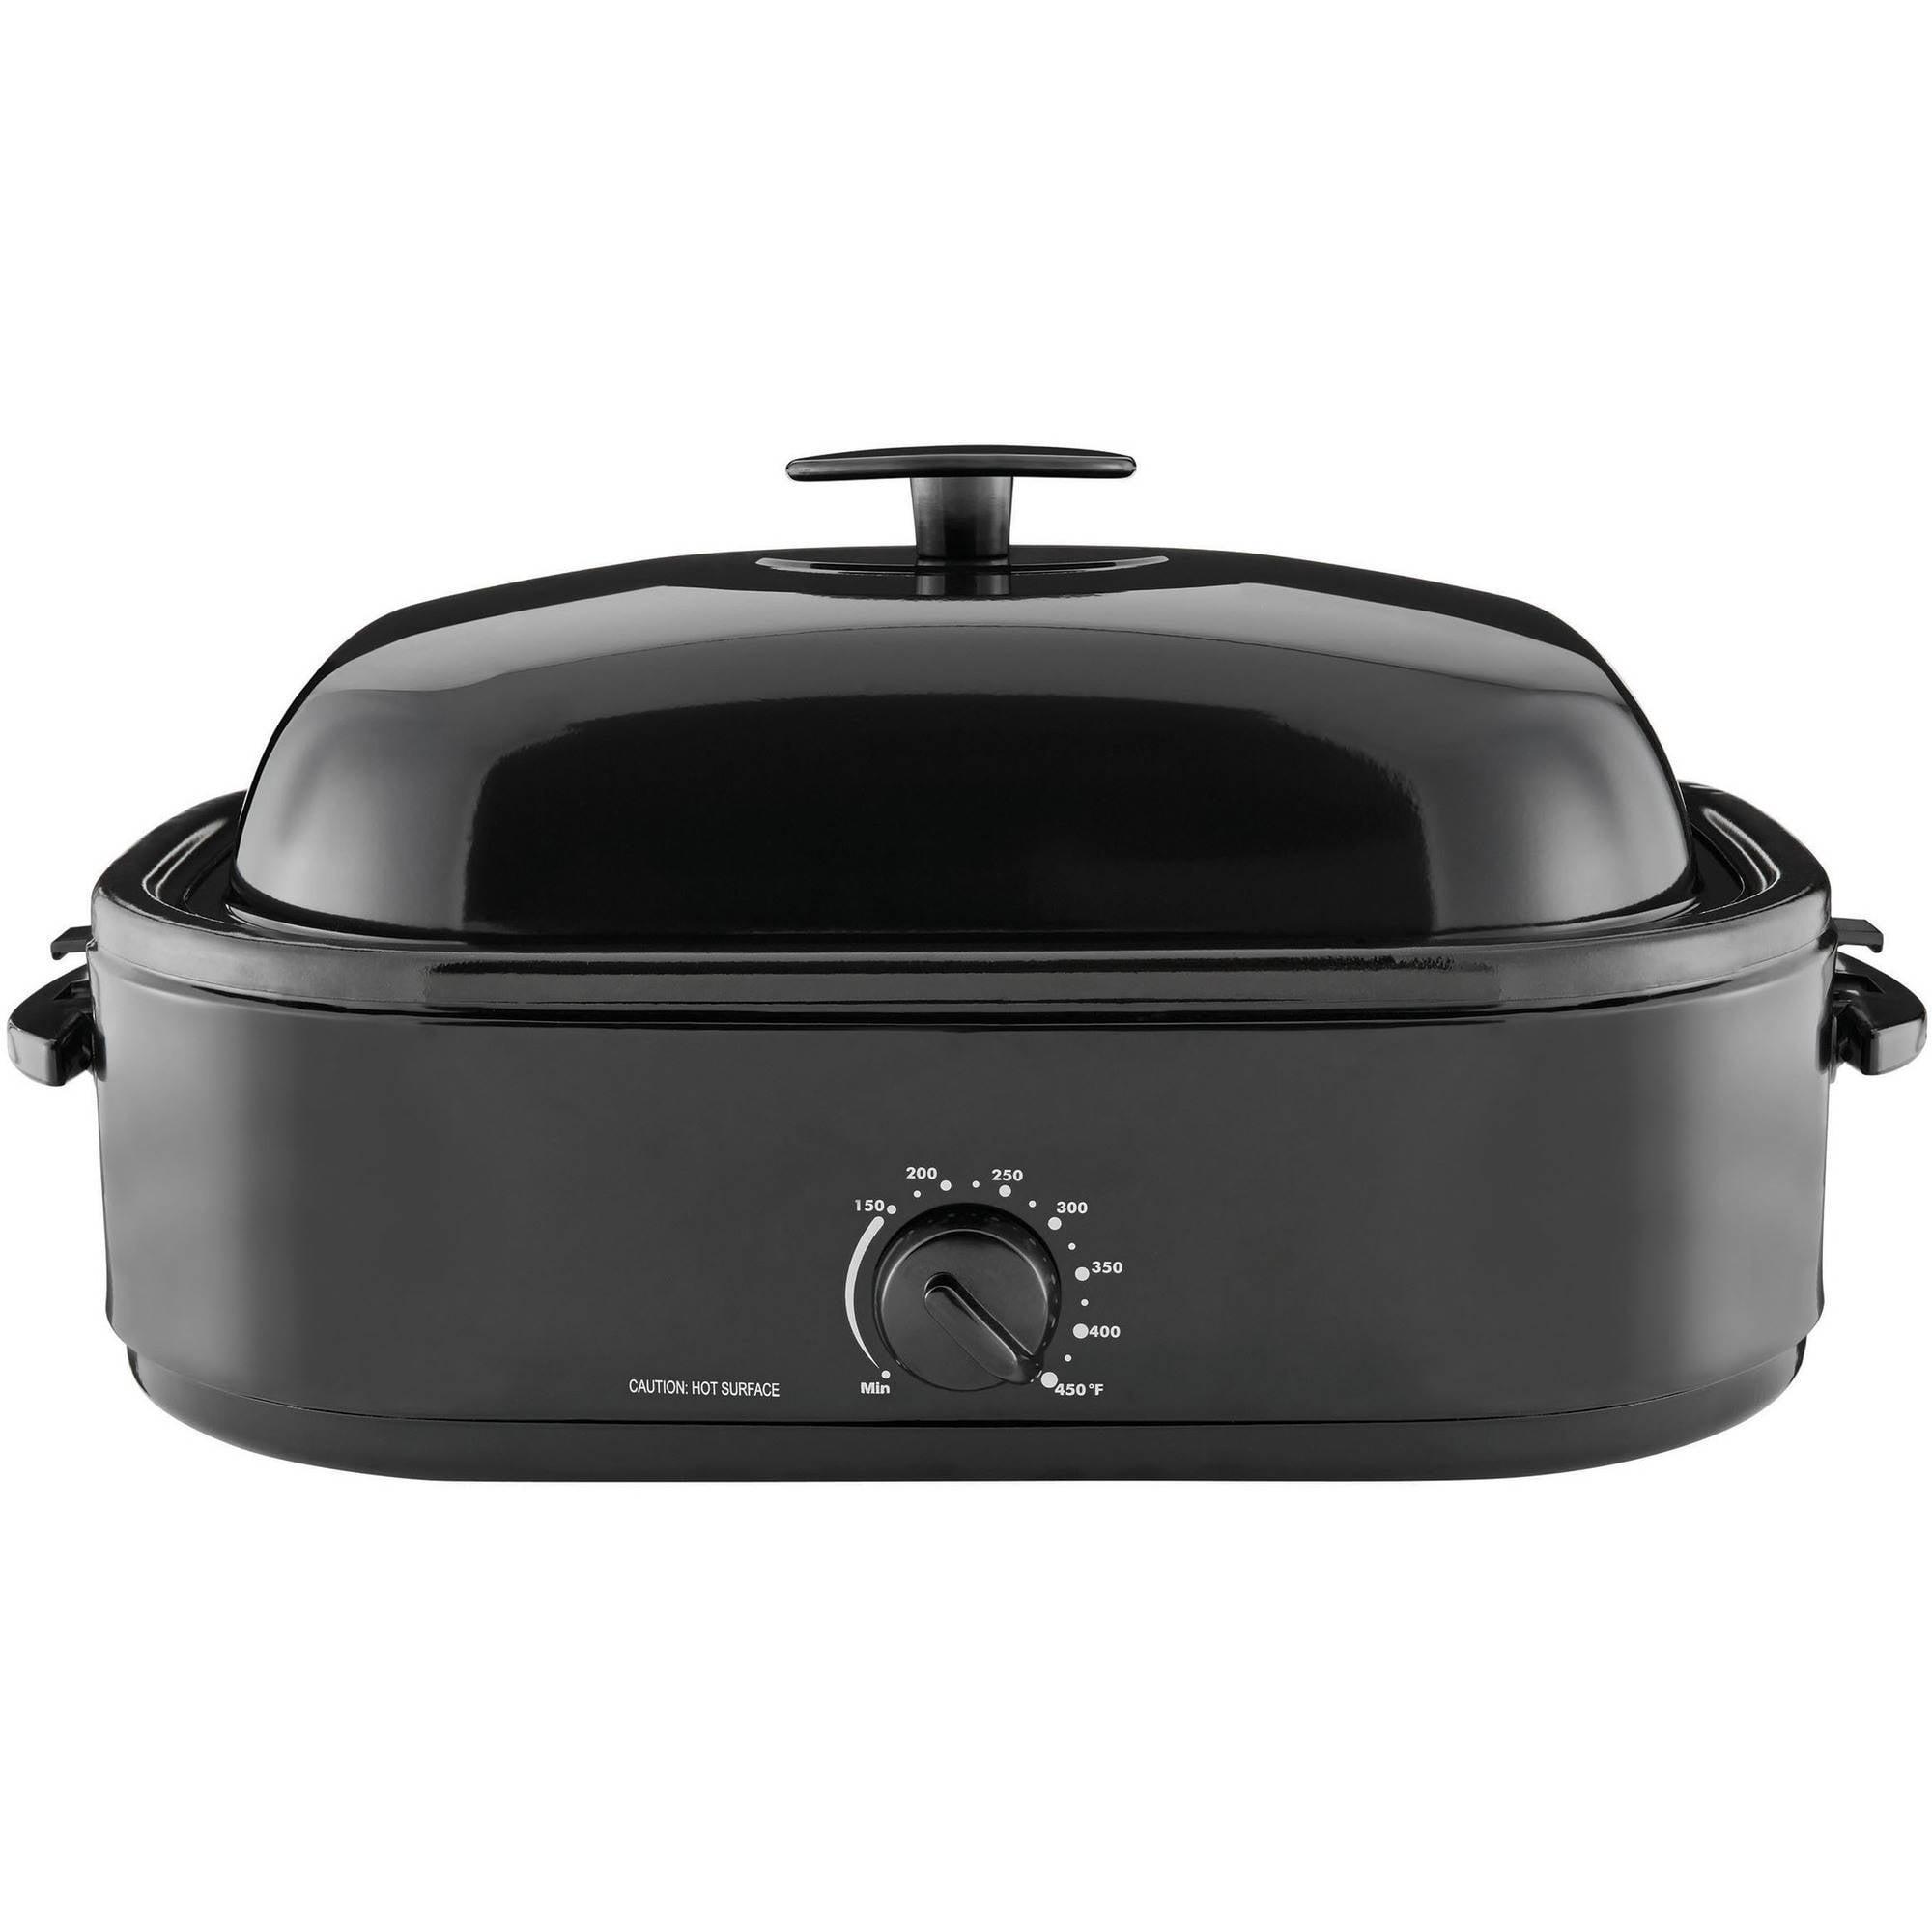 Mainstays 20-Pound Turkey Roaster with High-Dome Lid, 14-Quart, Black